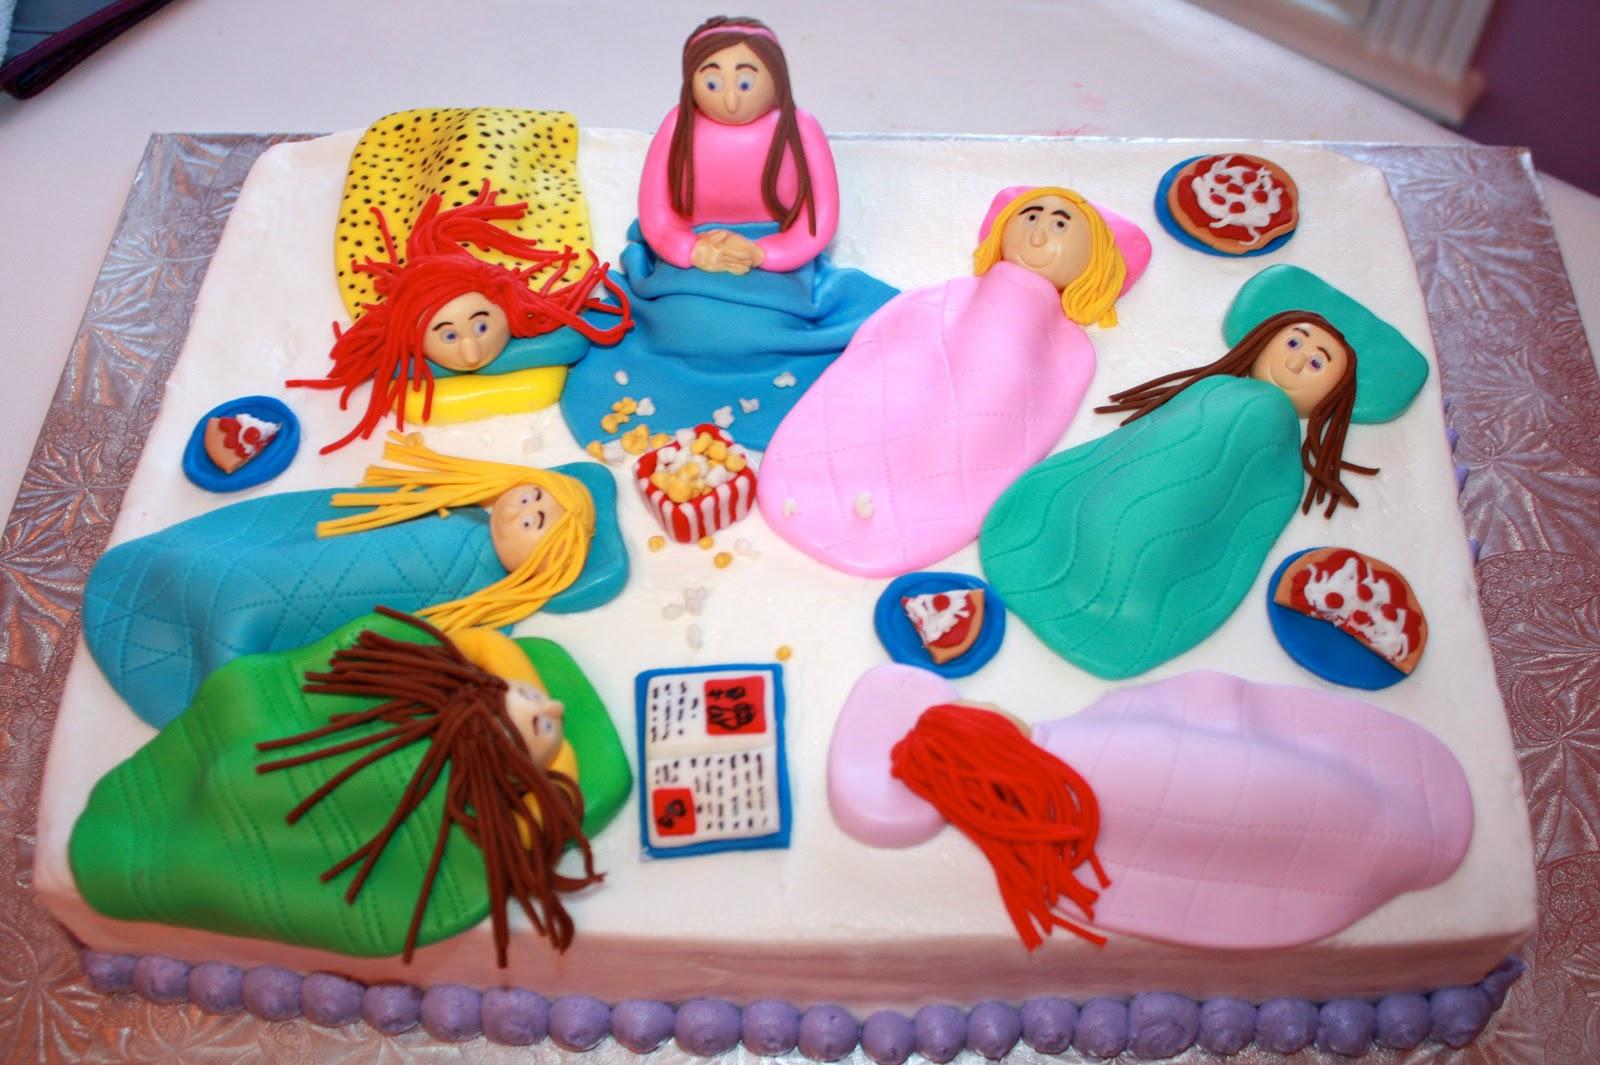 The Layered Cake: Slumber party cake